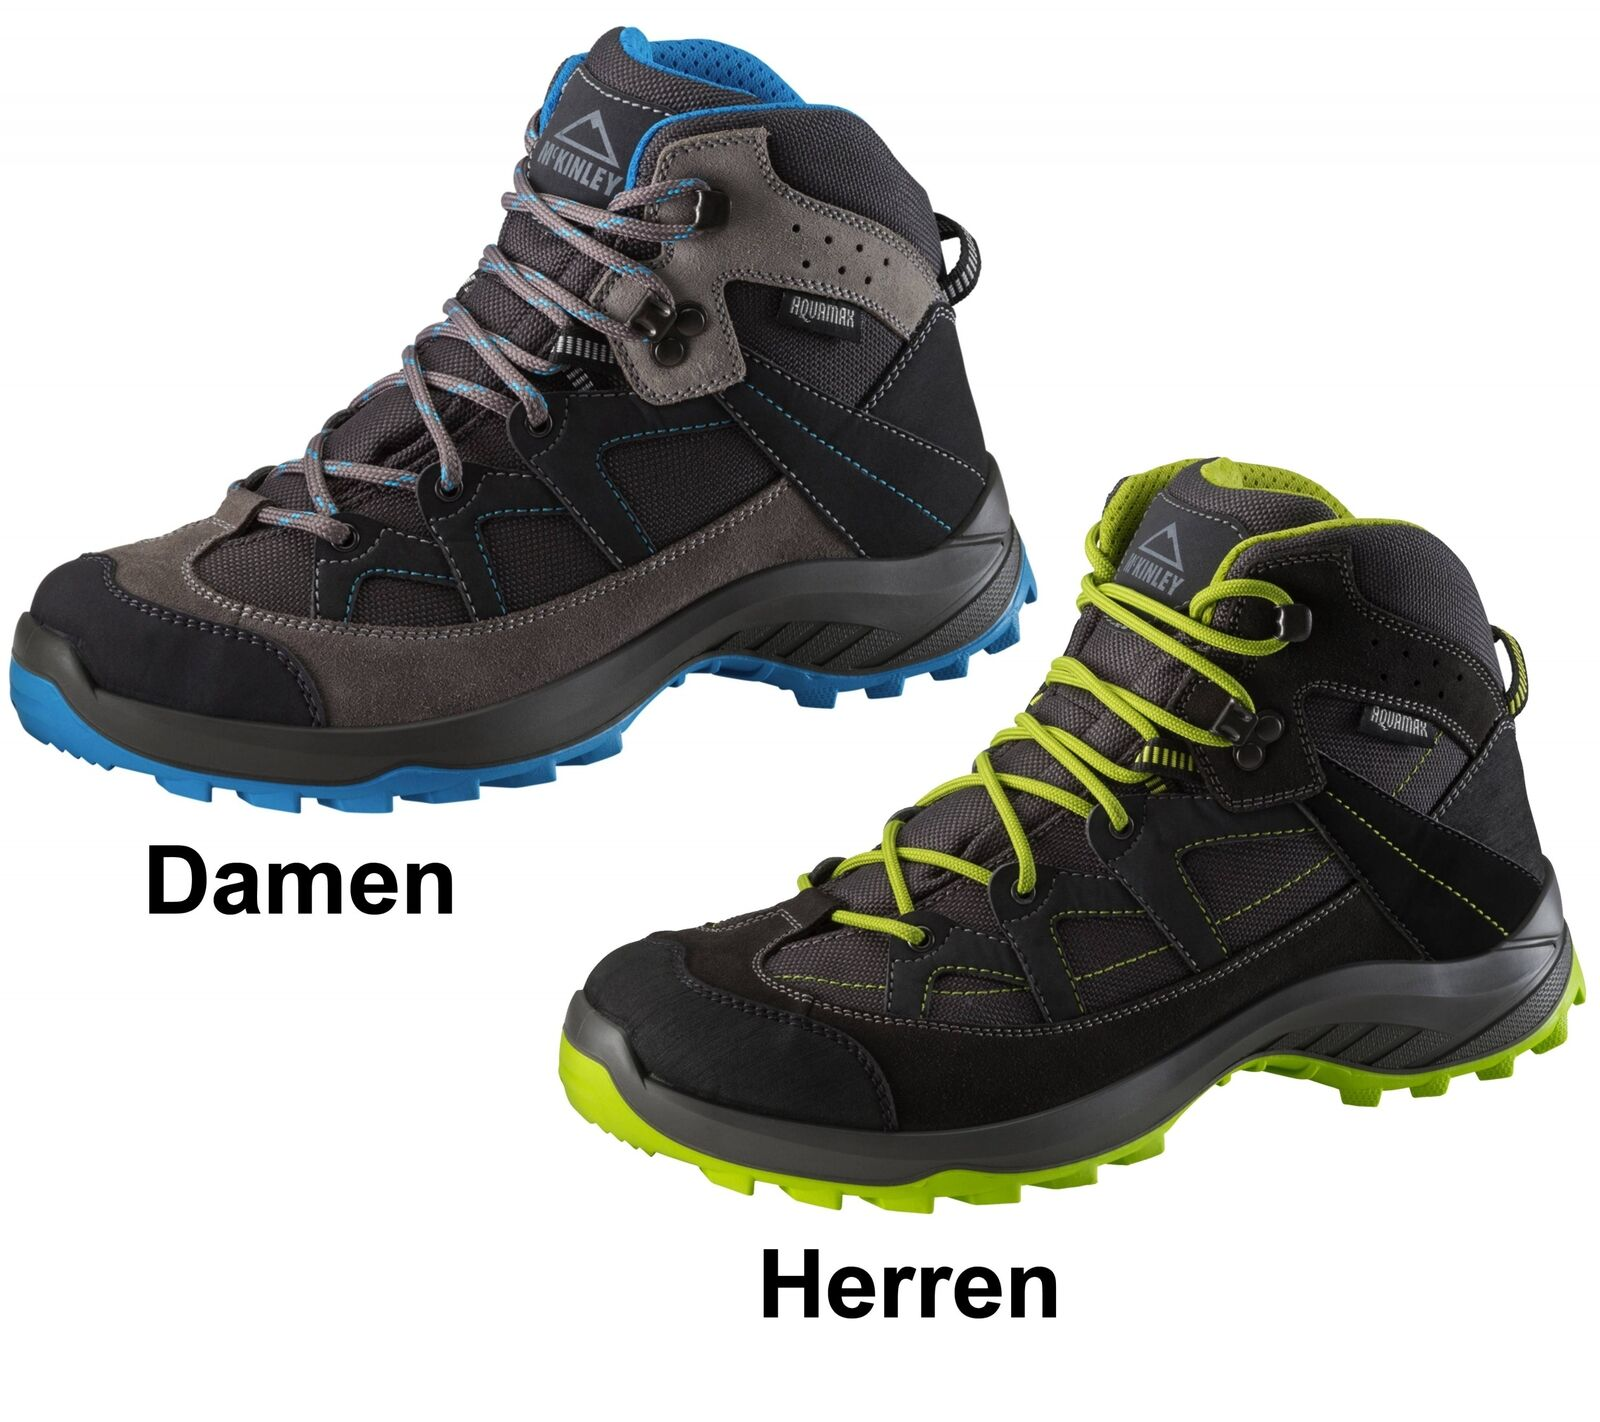 McKinly Leder Outdoor Wander Trekking Schuhe Discover Mid Aquamax Membrane Membrane Aquamax Neu 728d8a